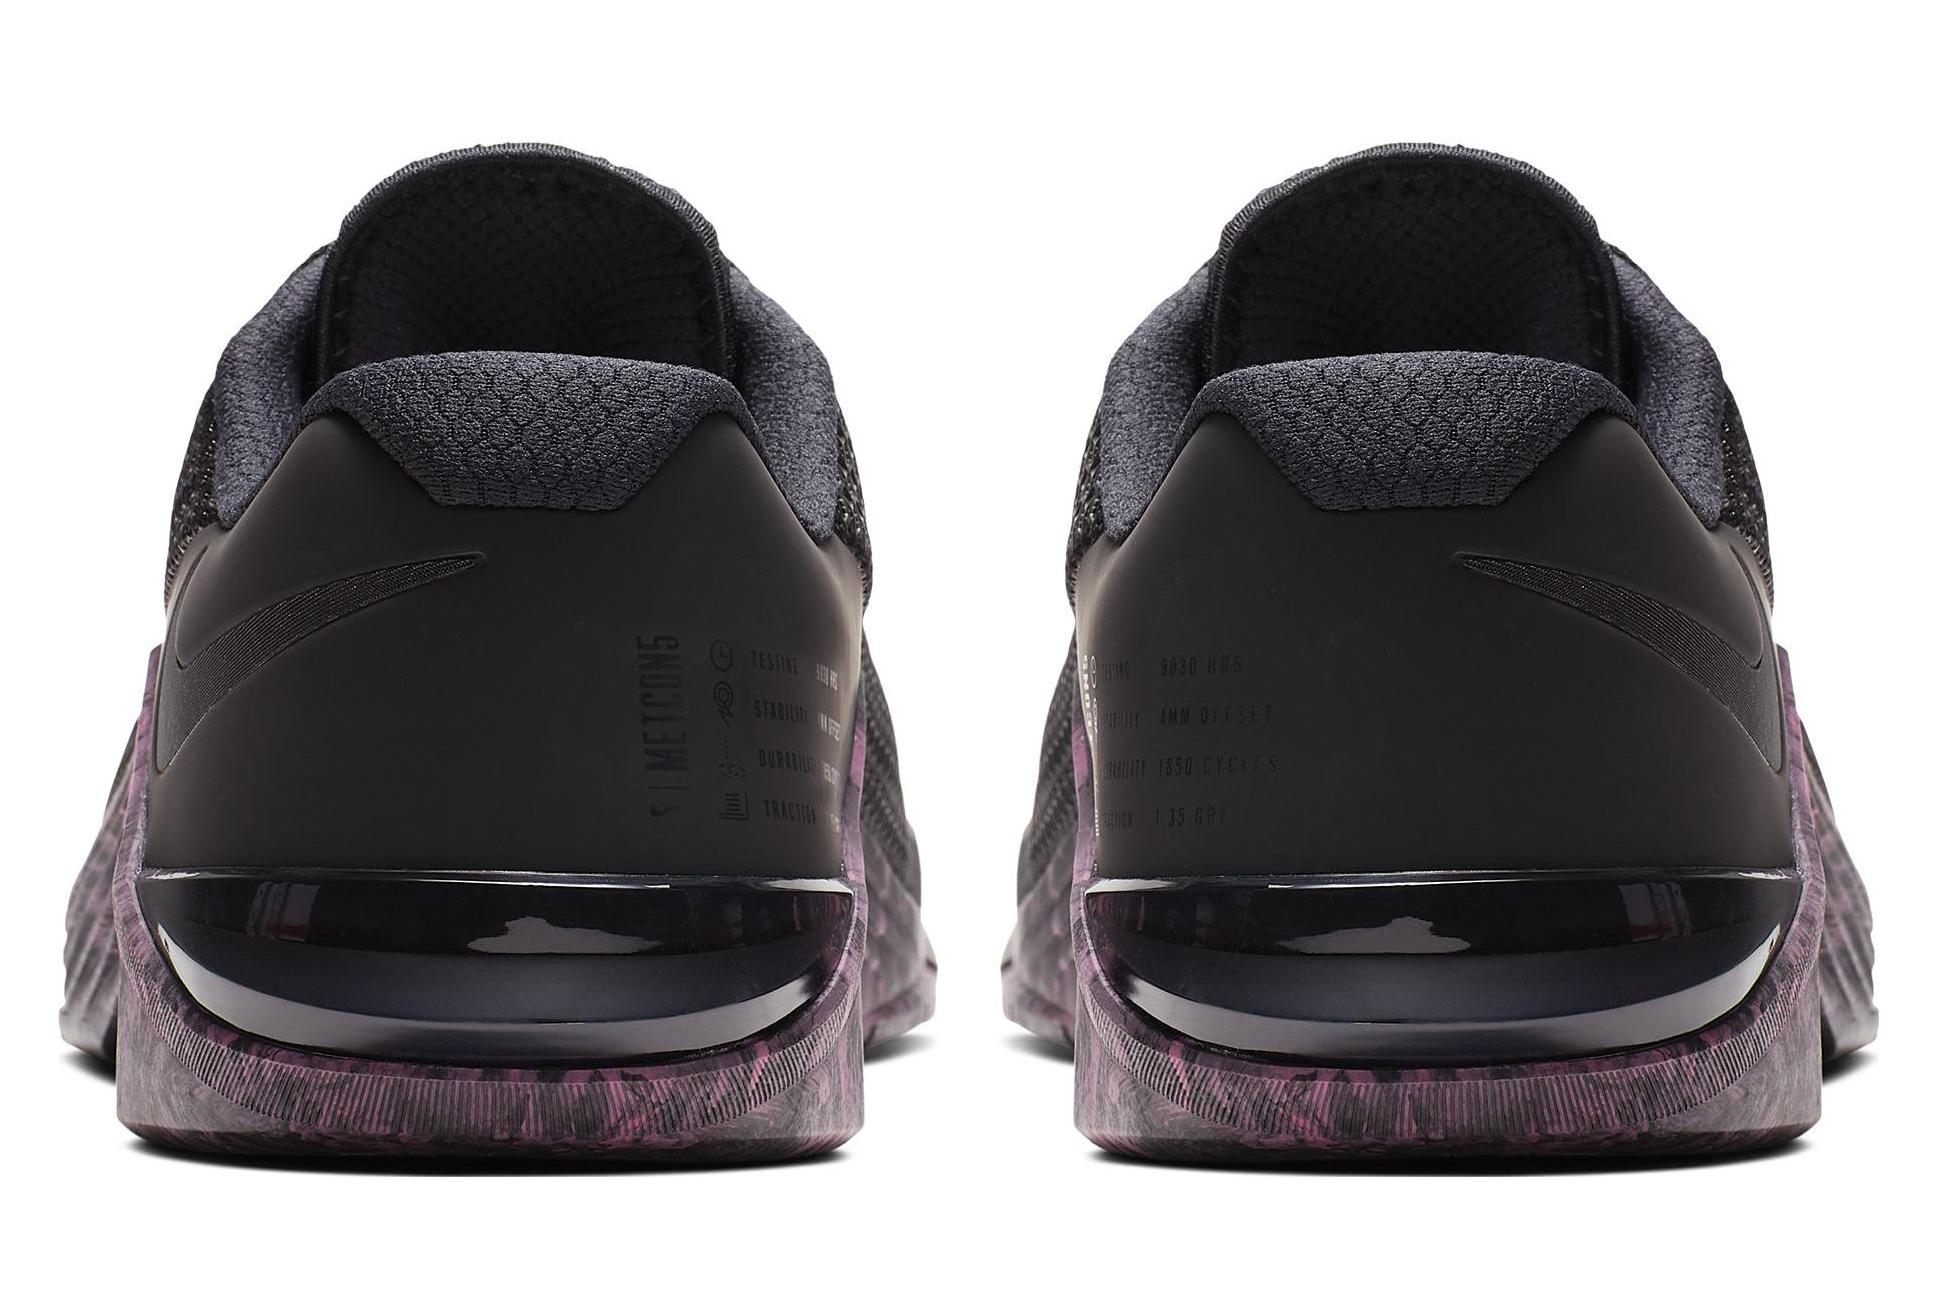 factory authentic excellent quality new arrival Chaussures de Cross Training Nike Metcon 5 Noir / Violet ...